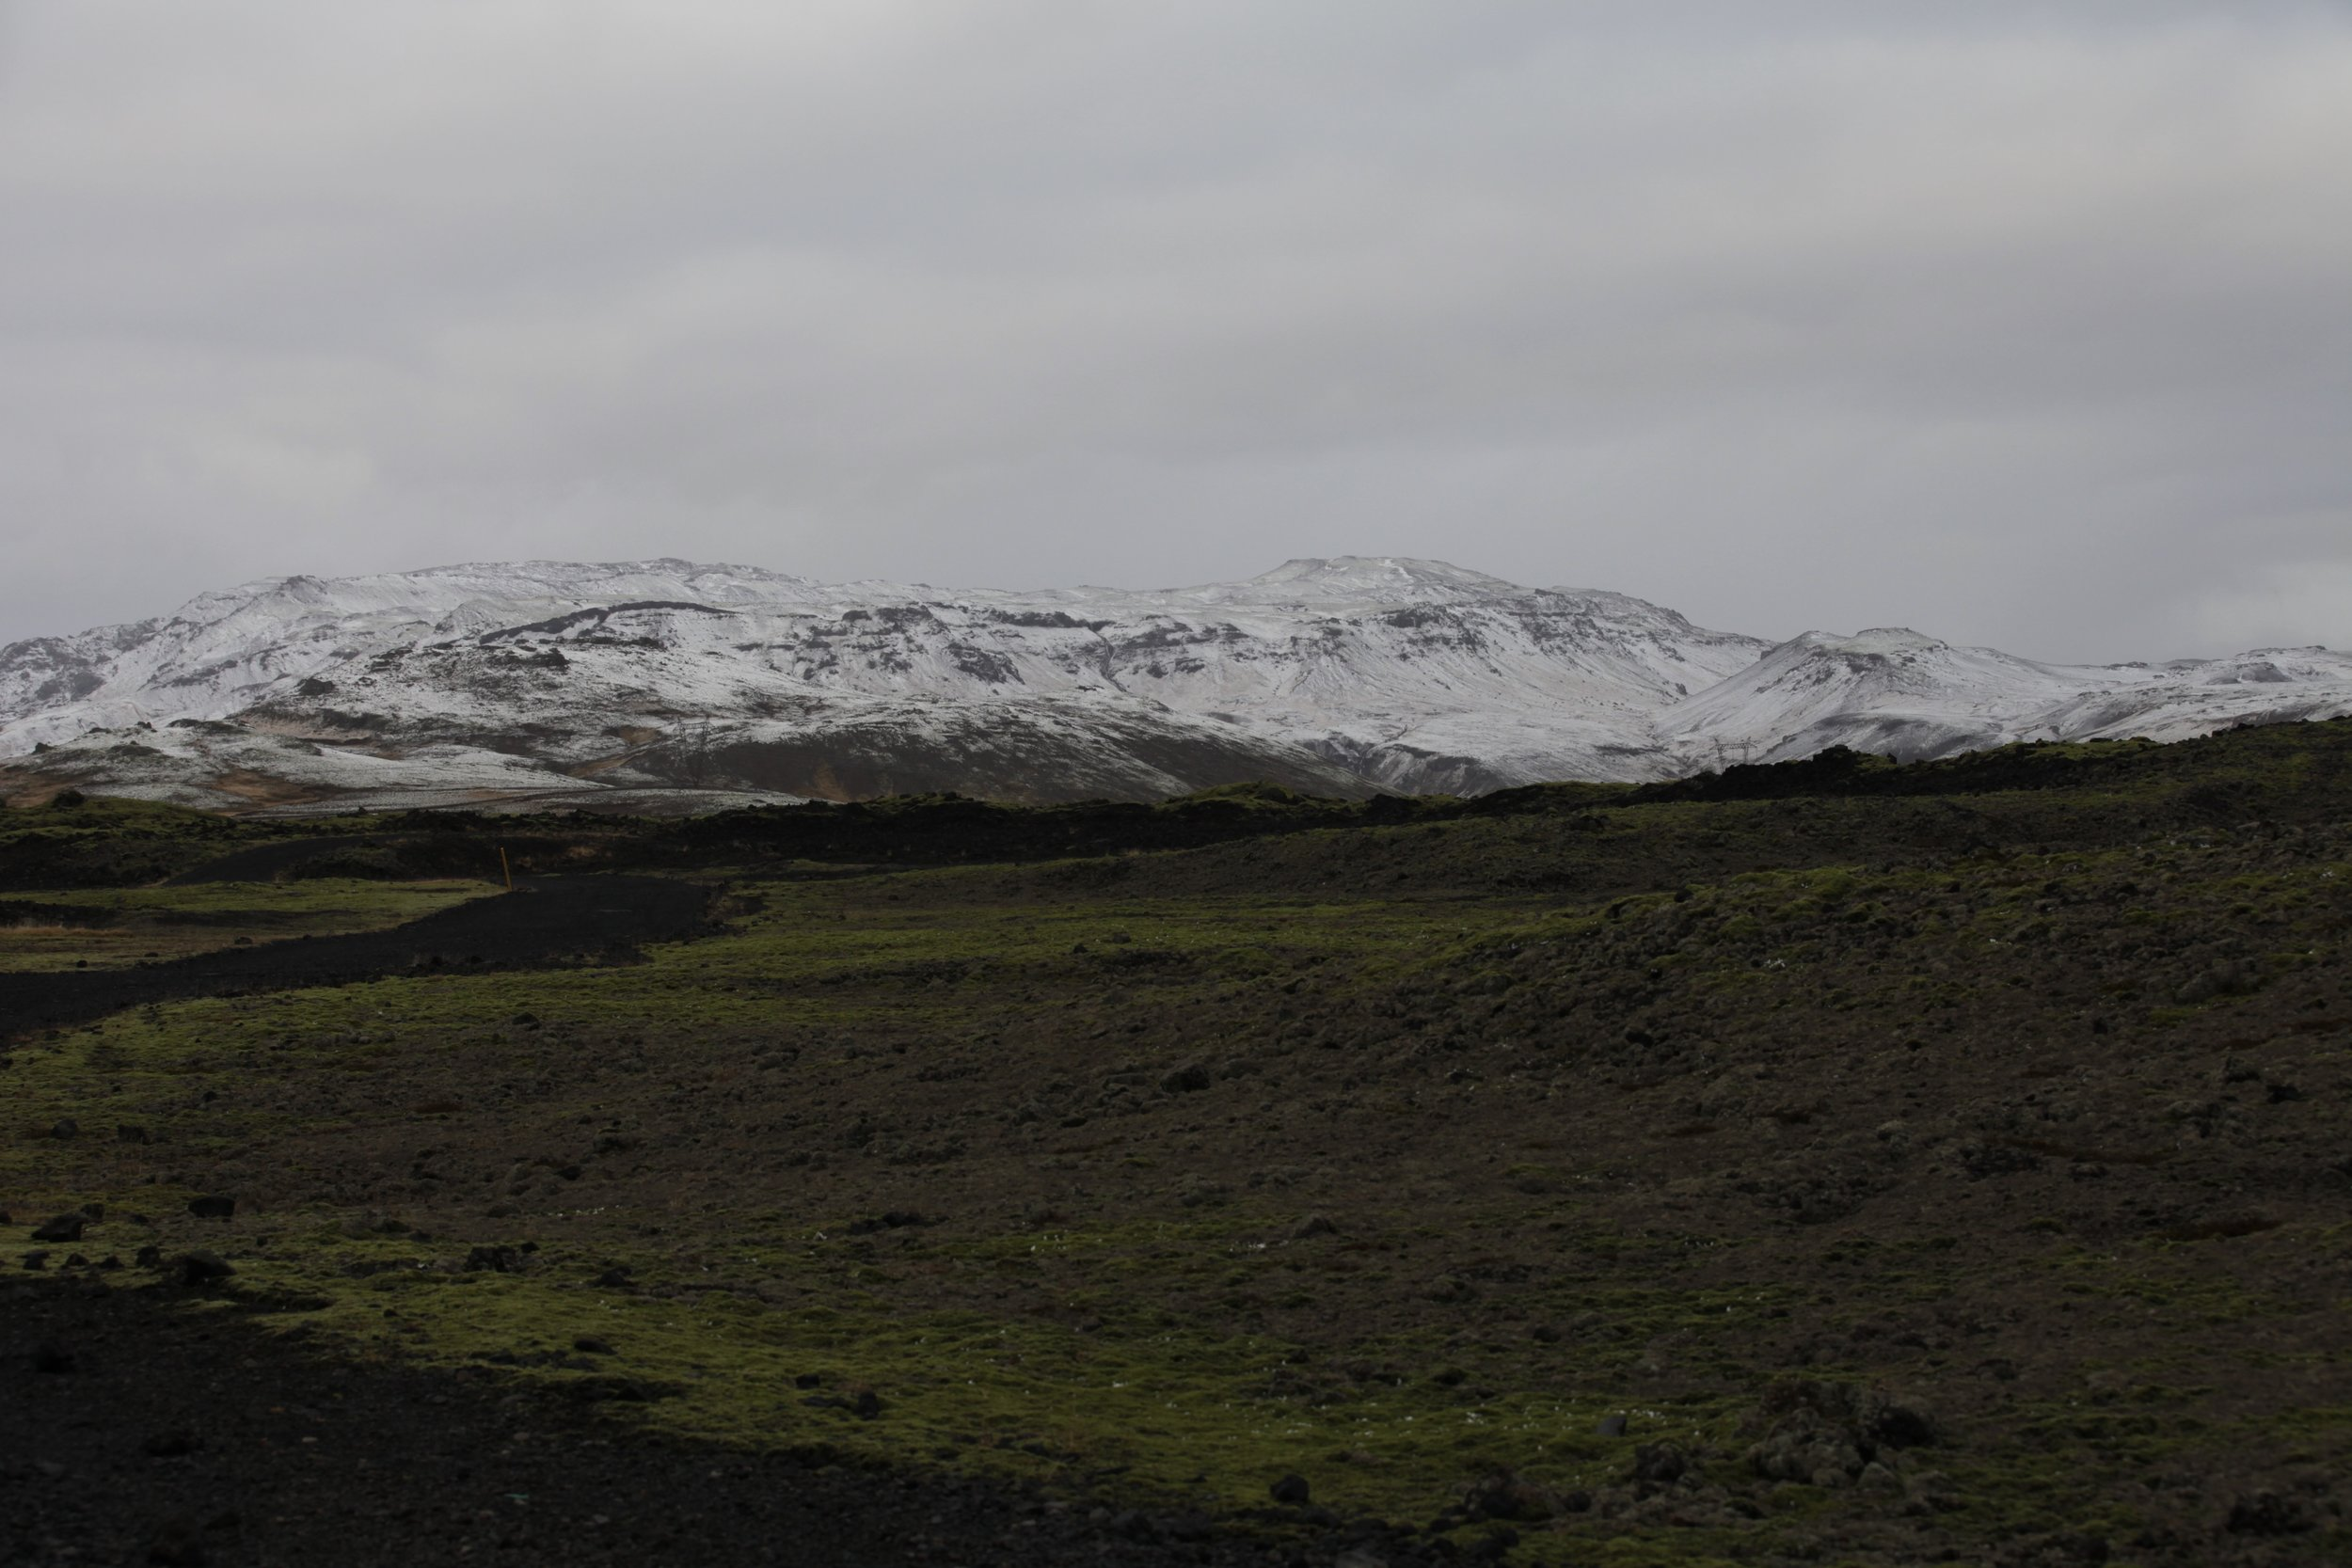 22 HnM - Performance Kilián Ignác D. Iceland 2016.jpg